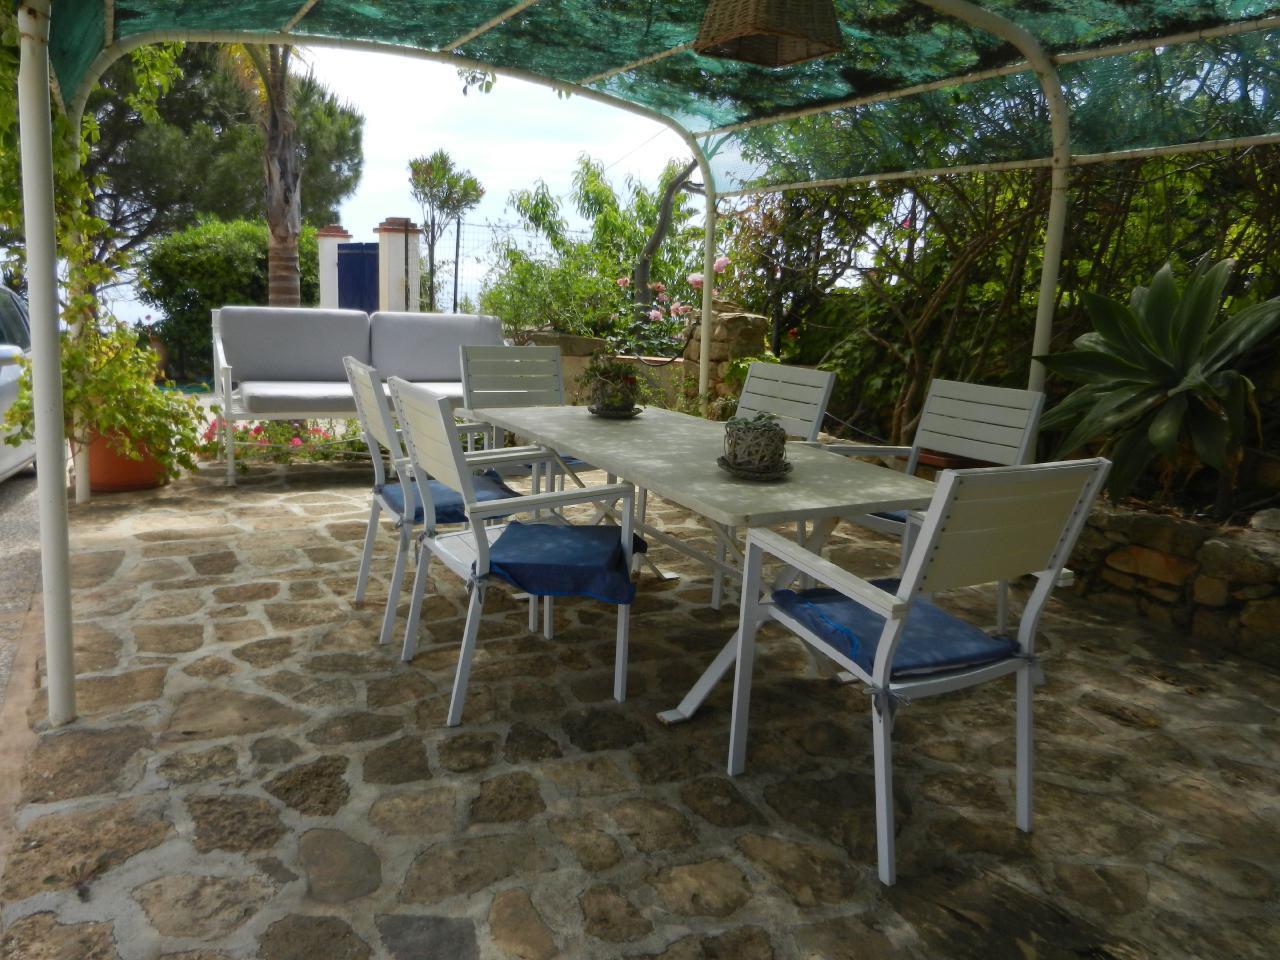 Maison de vacances Villa Mediterranea (57184), Menfi, Agrigento, Sicile, Italie, image 26